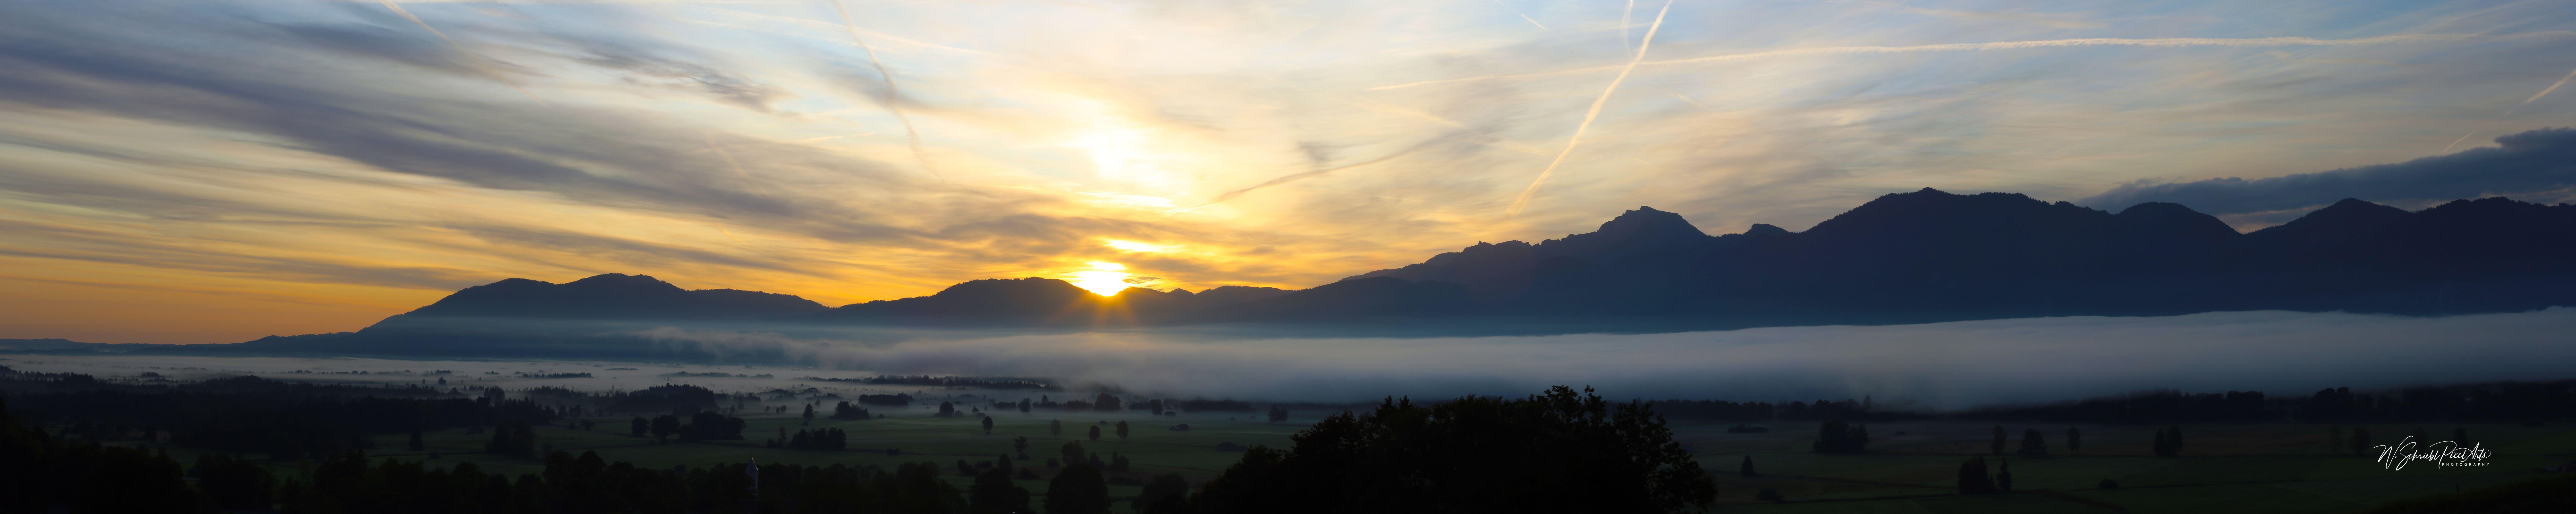 Morgennebel im Loisachtal